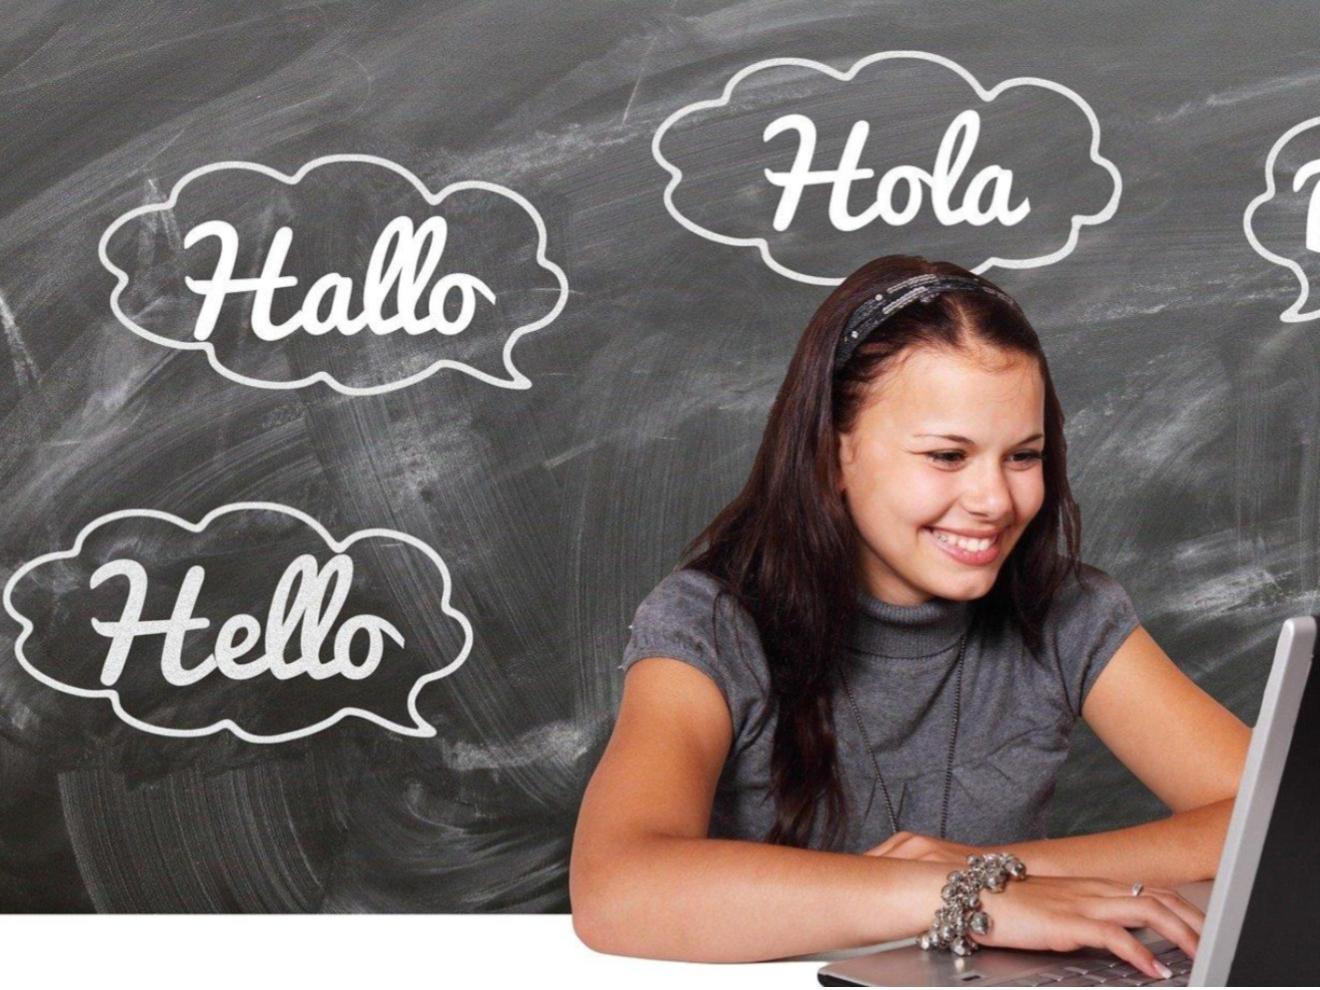 Benefits of being bilingual (hola, hello, ola)